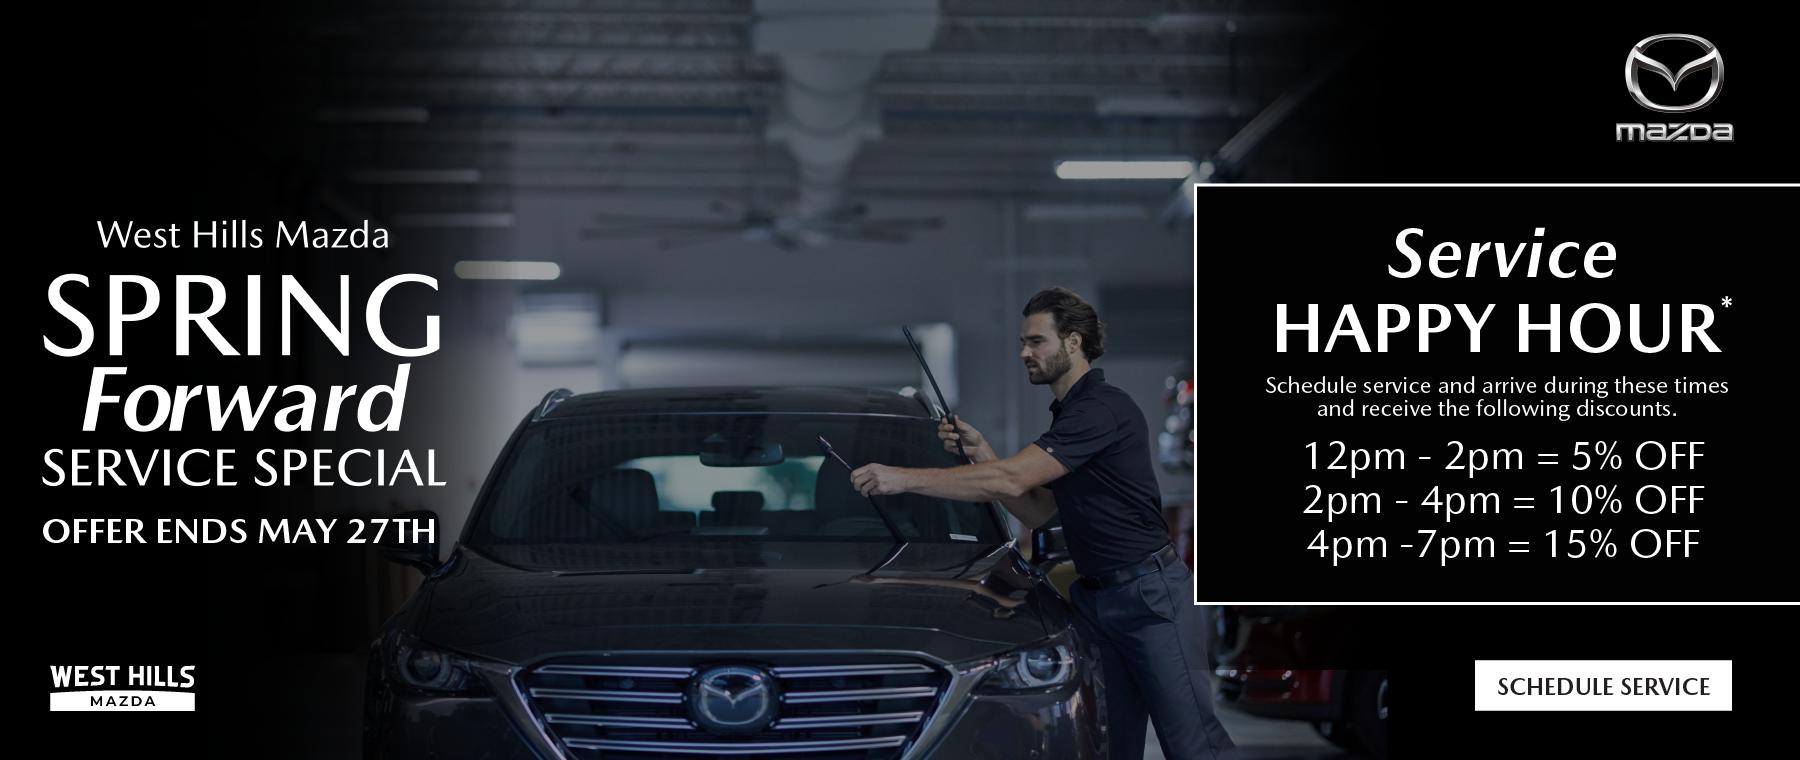 11810 – MAR21 – WHAP – Spring Forward Service Special – Webslides_Mazda – 1800×760 (1)